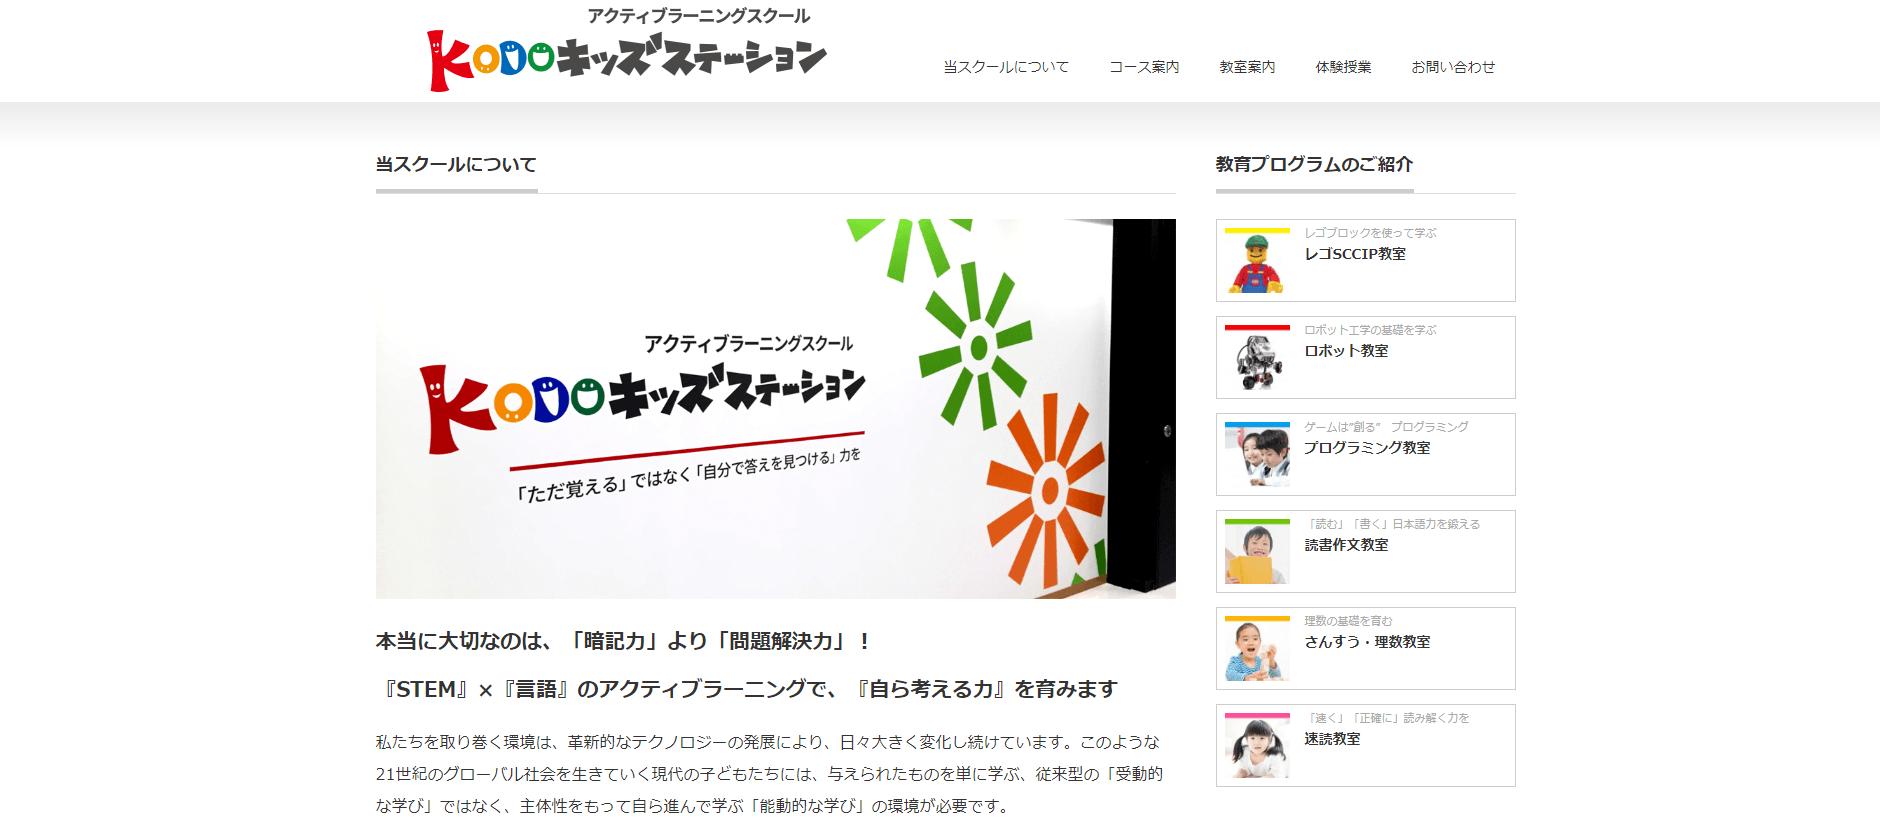 KODOキッズステーション 水戸駅前教室